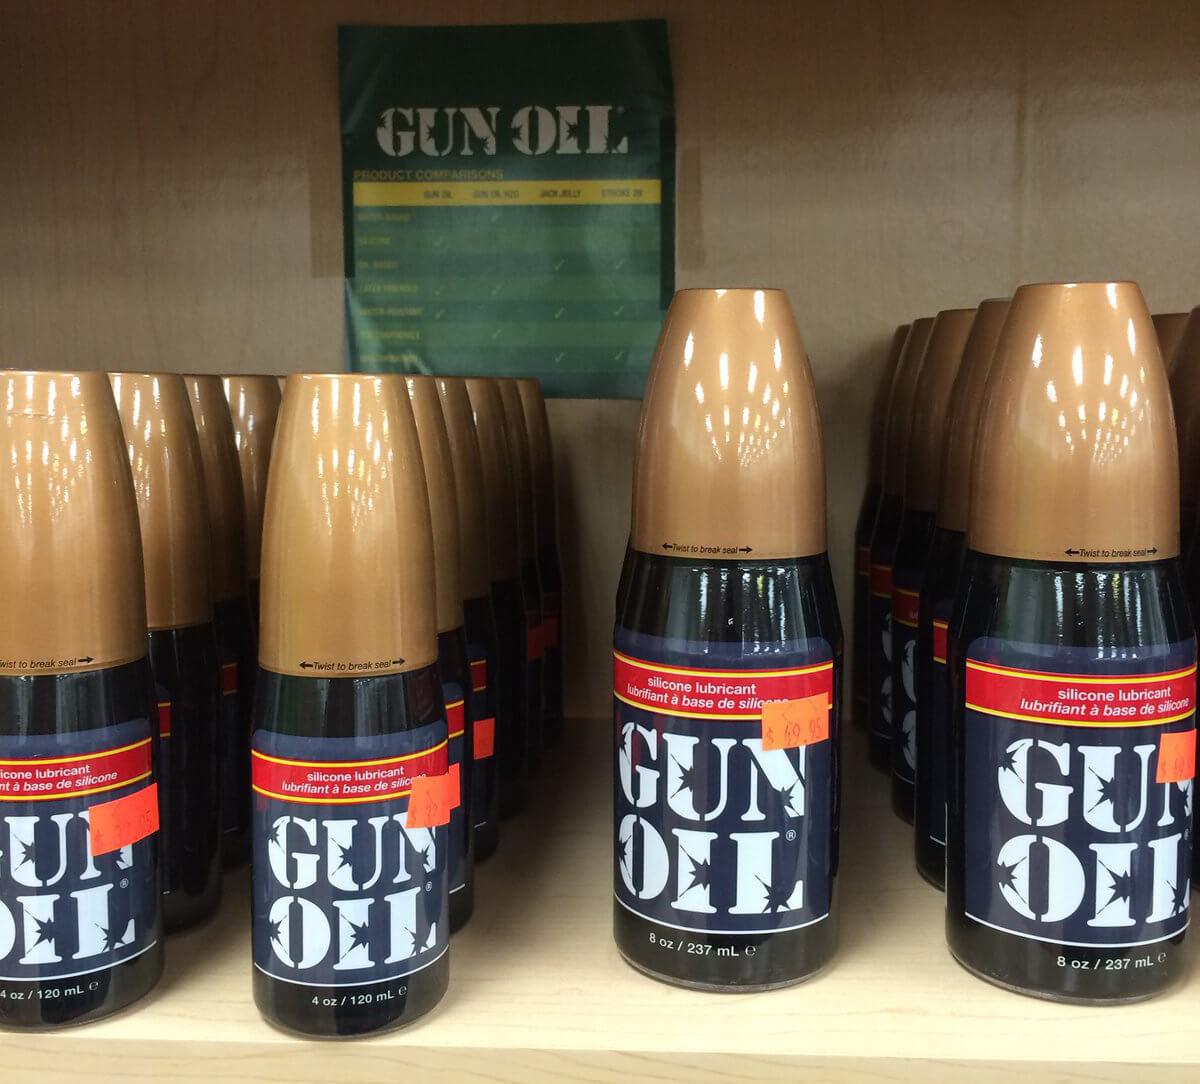 GUN OIL润滑液